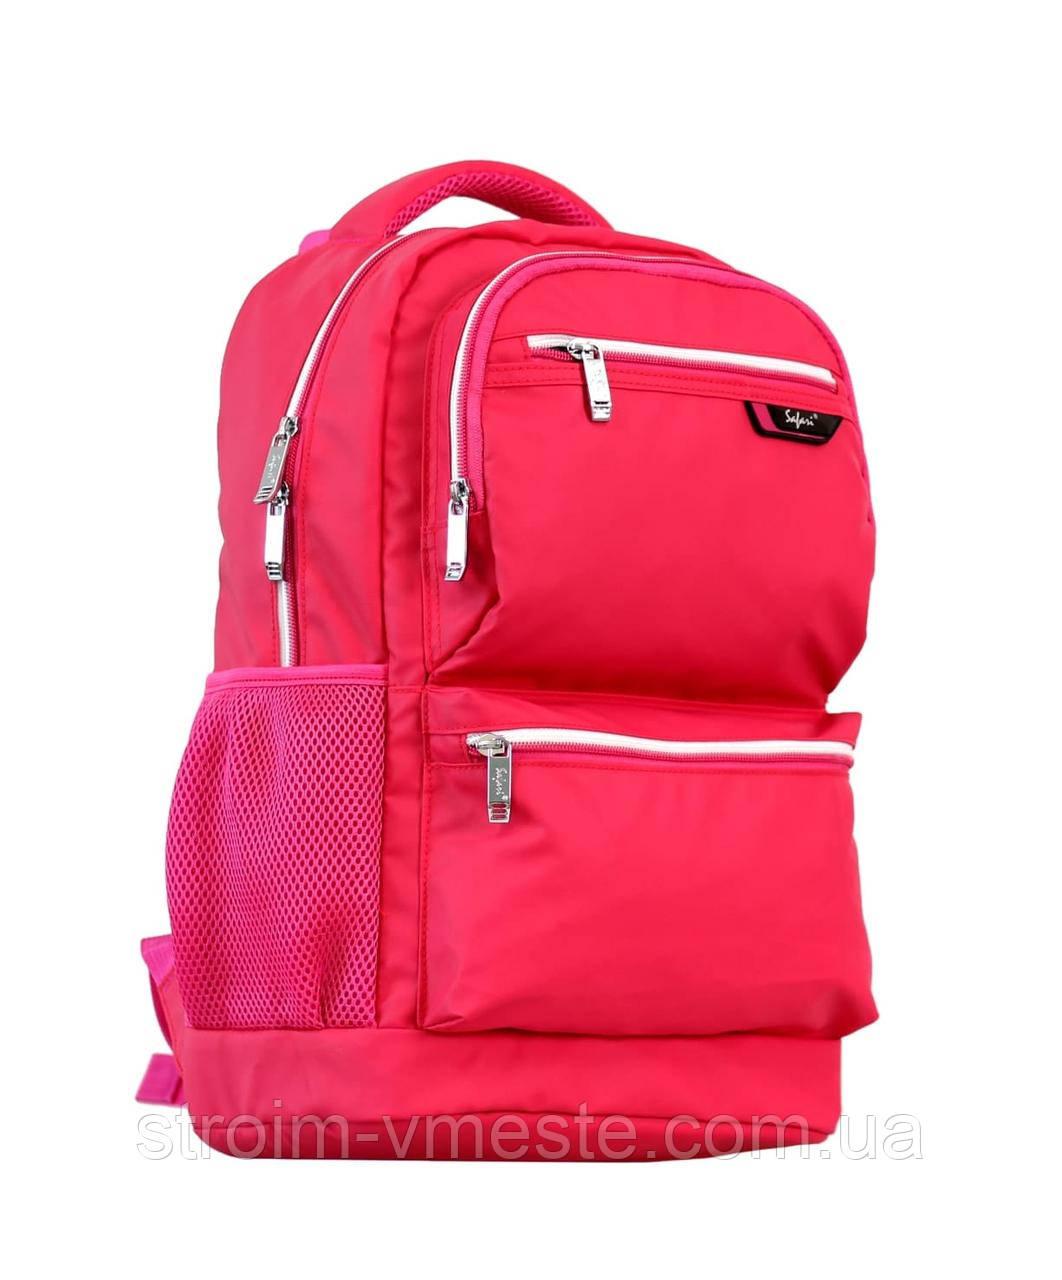 Рюкзак 2 отд 42*27*16 см 900D PL SAFARI Trend 1852